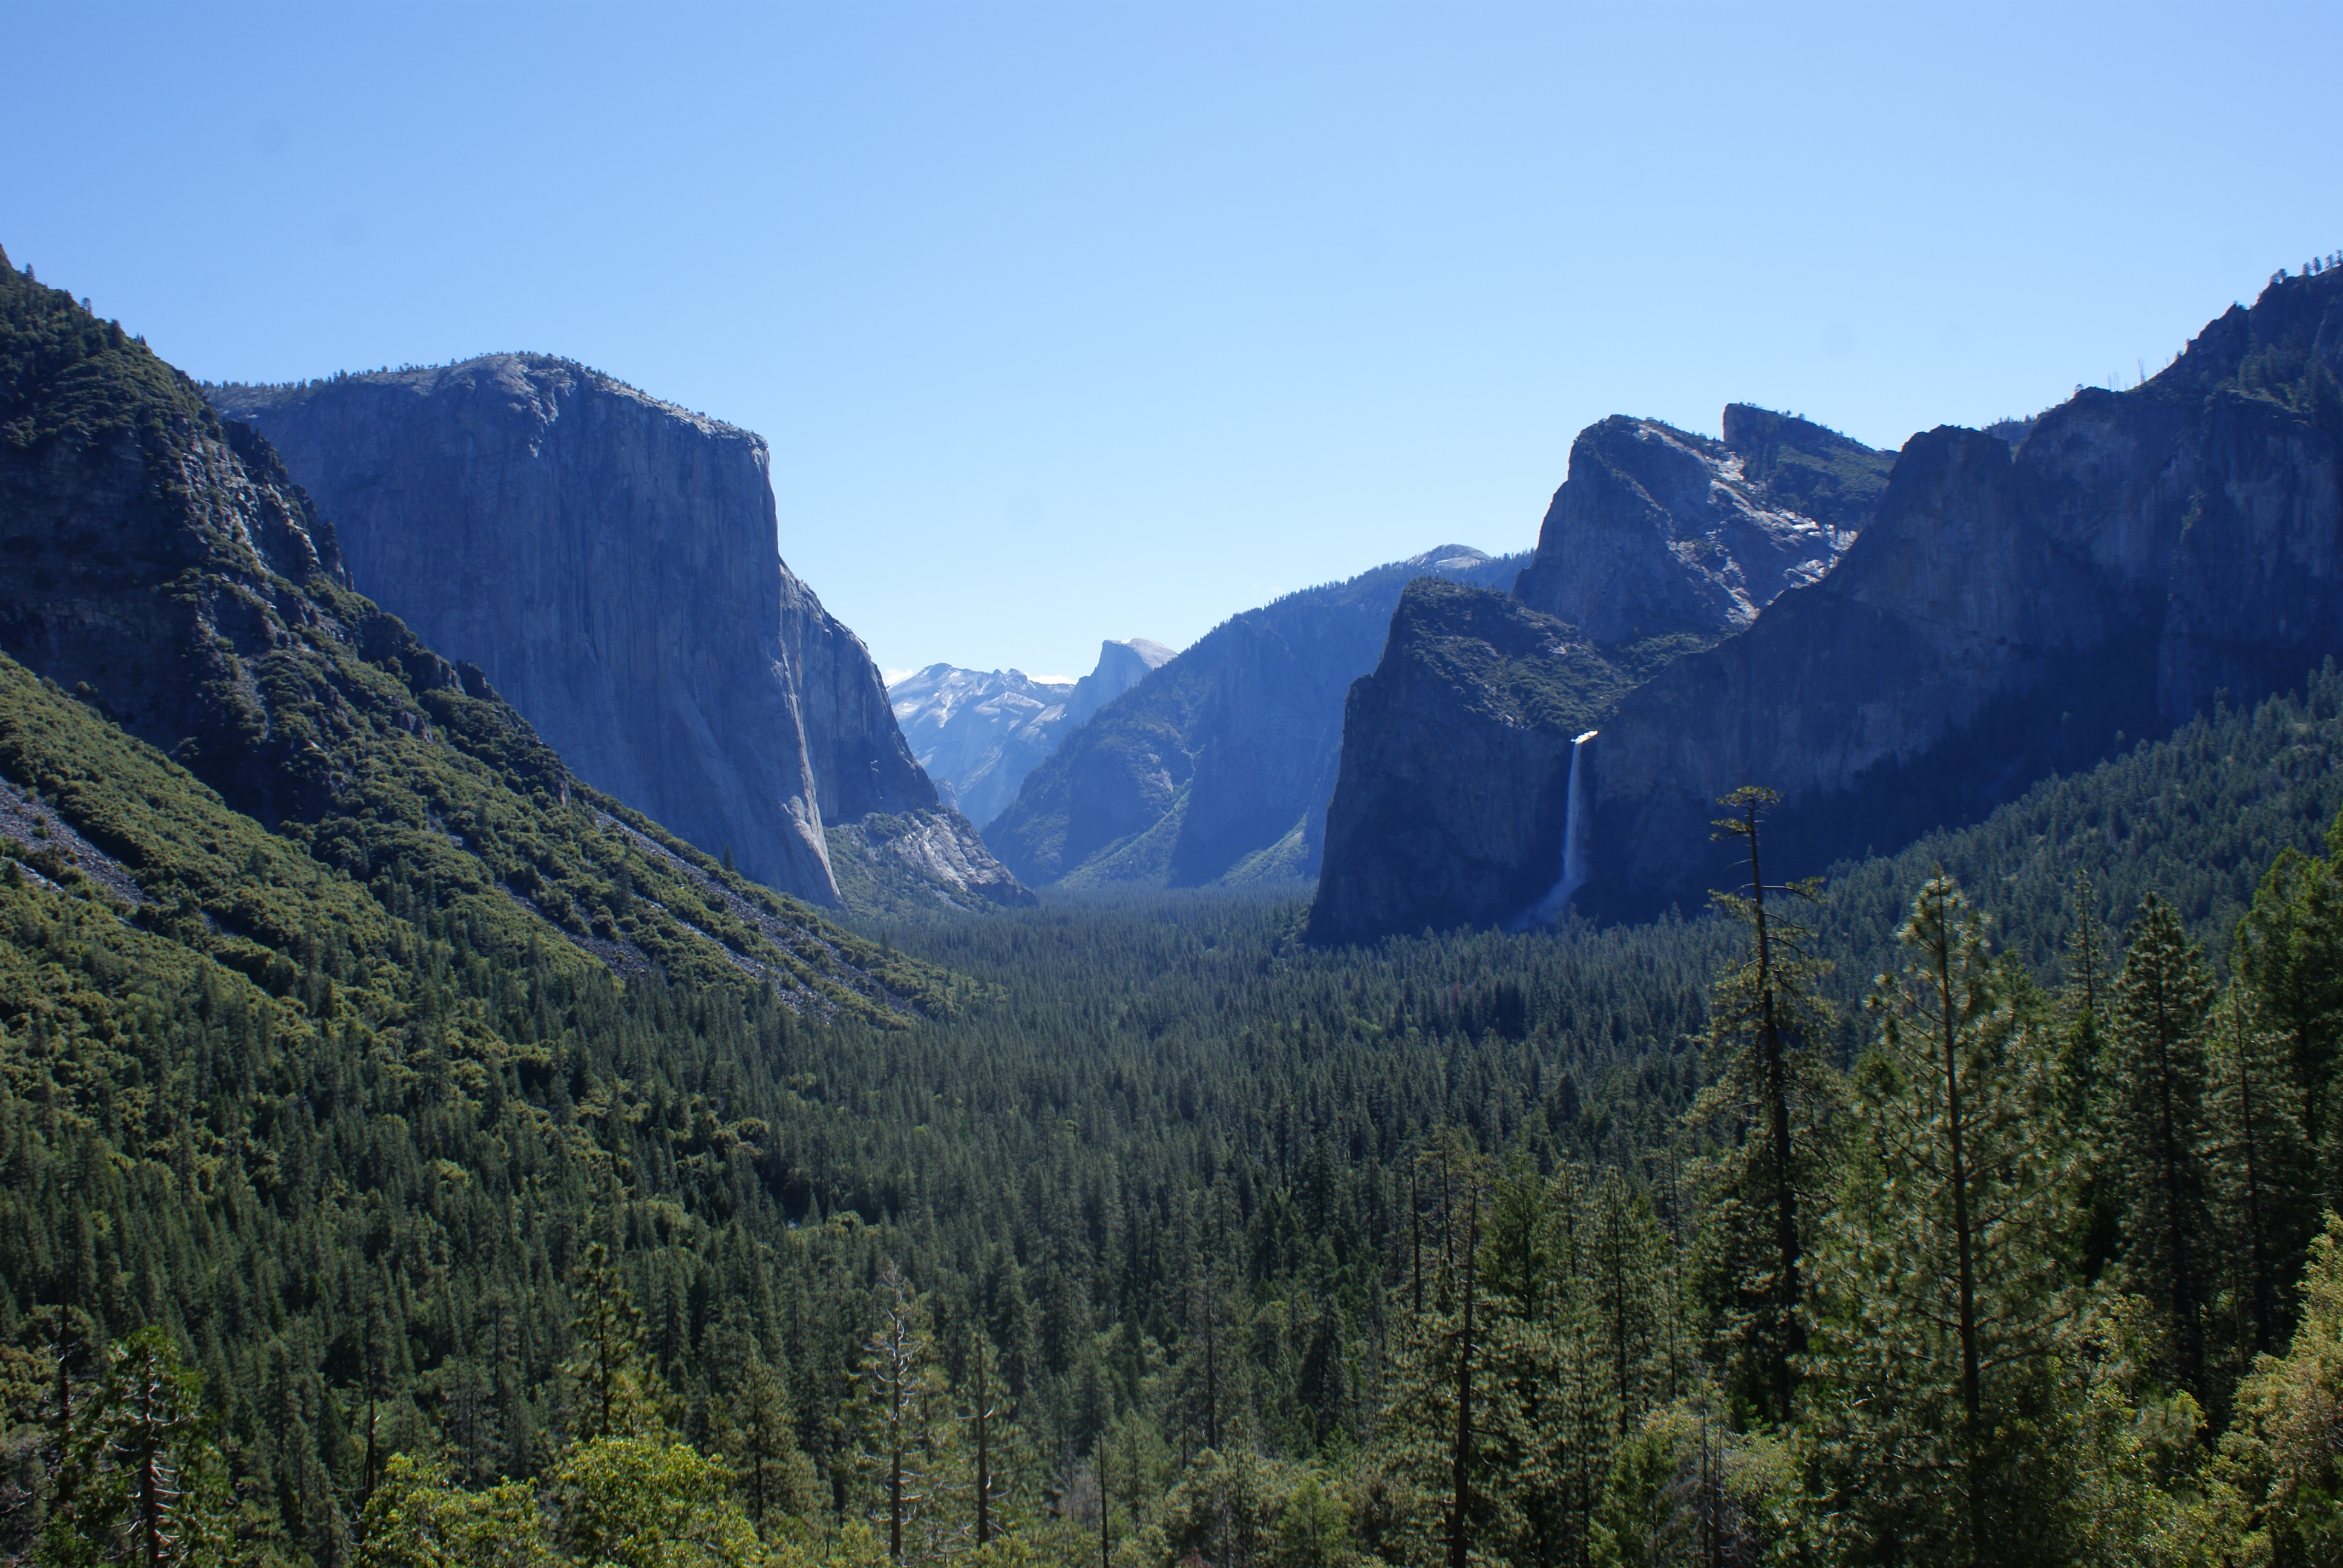 Yosemite National Park, California, California, Mountain ridge, Unitedstates, Summer, HQ Photo